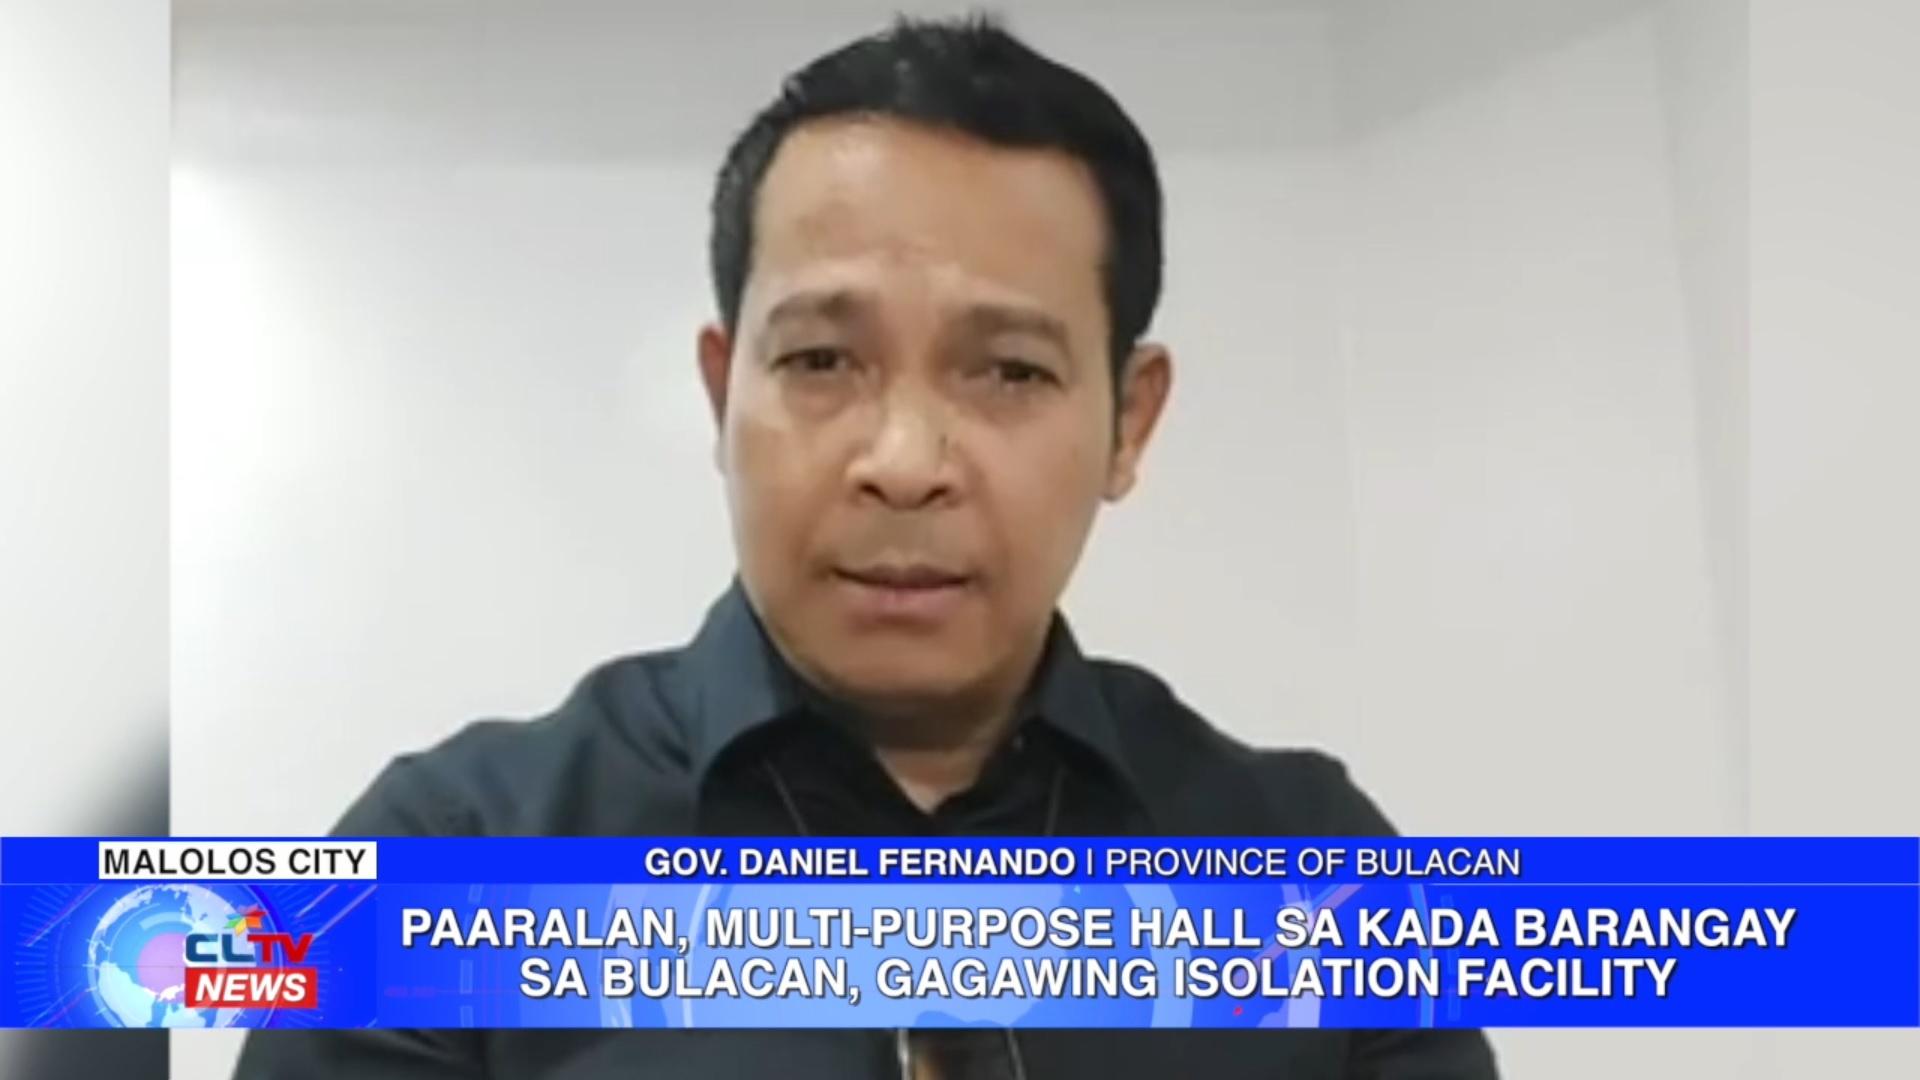 Paaralan, multi-purpose hall sa kada barangay sa Bulacan, gagawing isolation facility | CLTV36 News